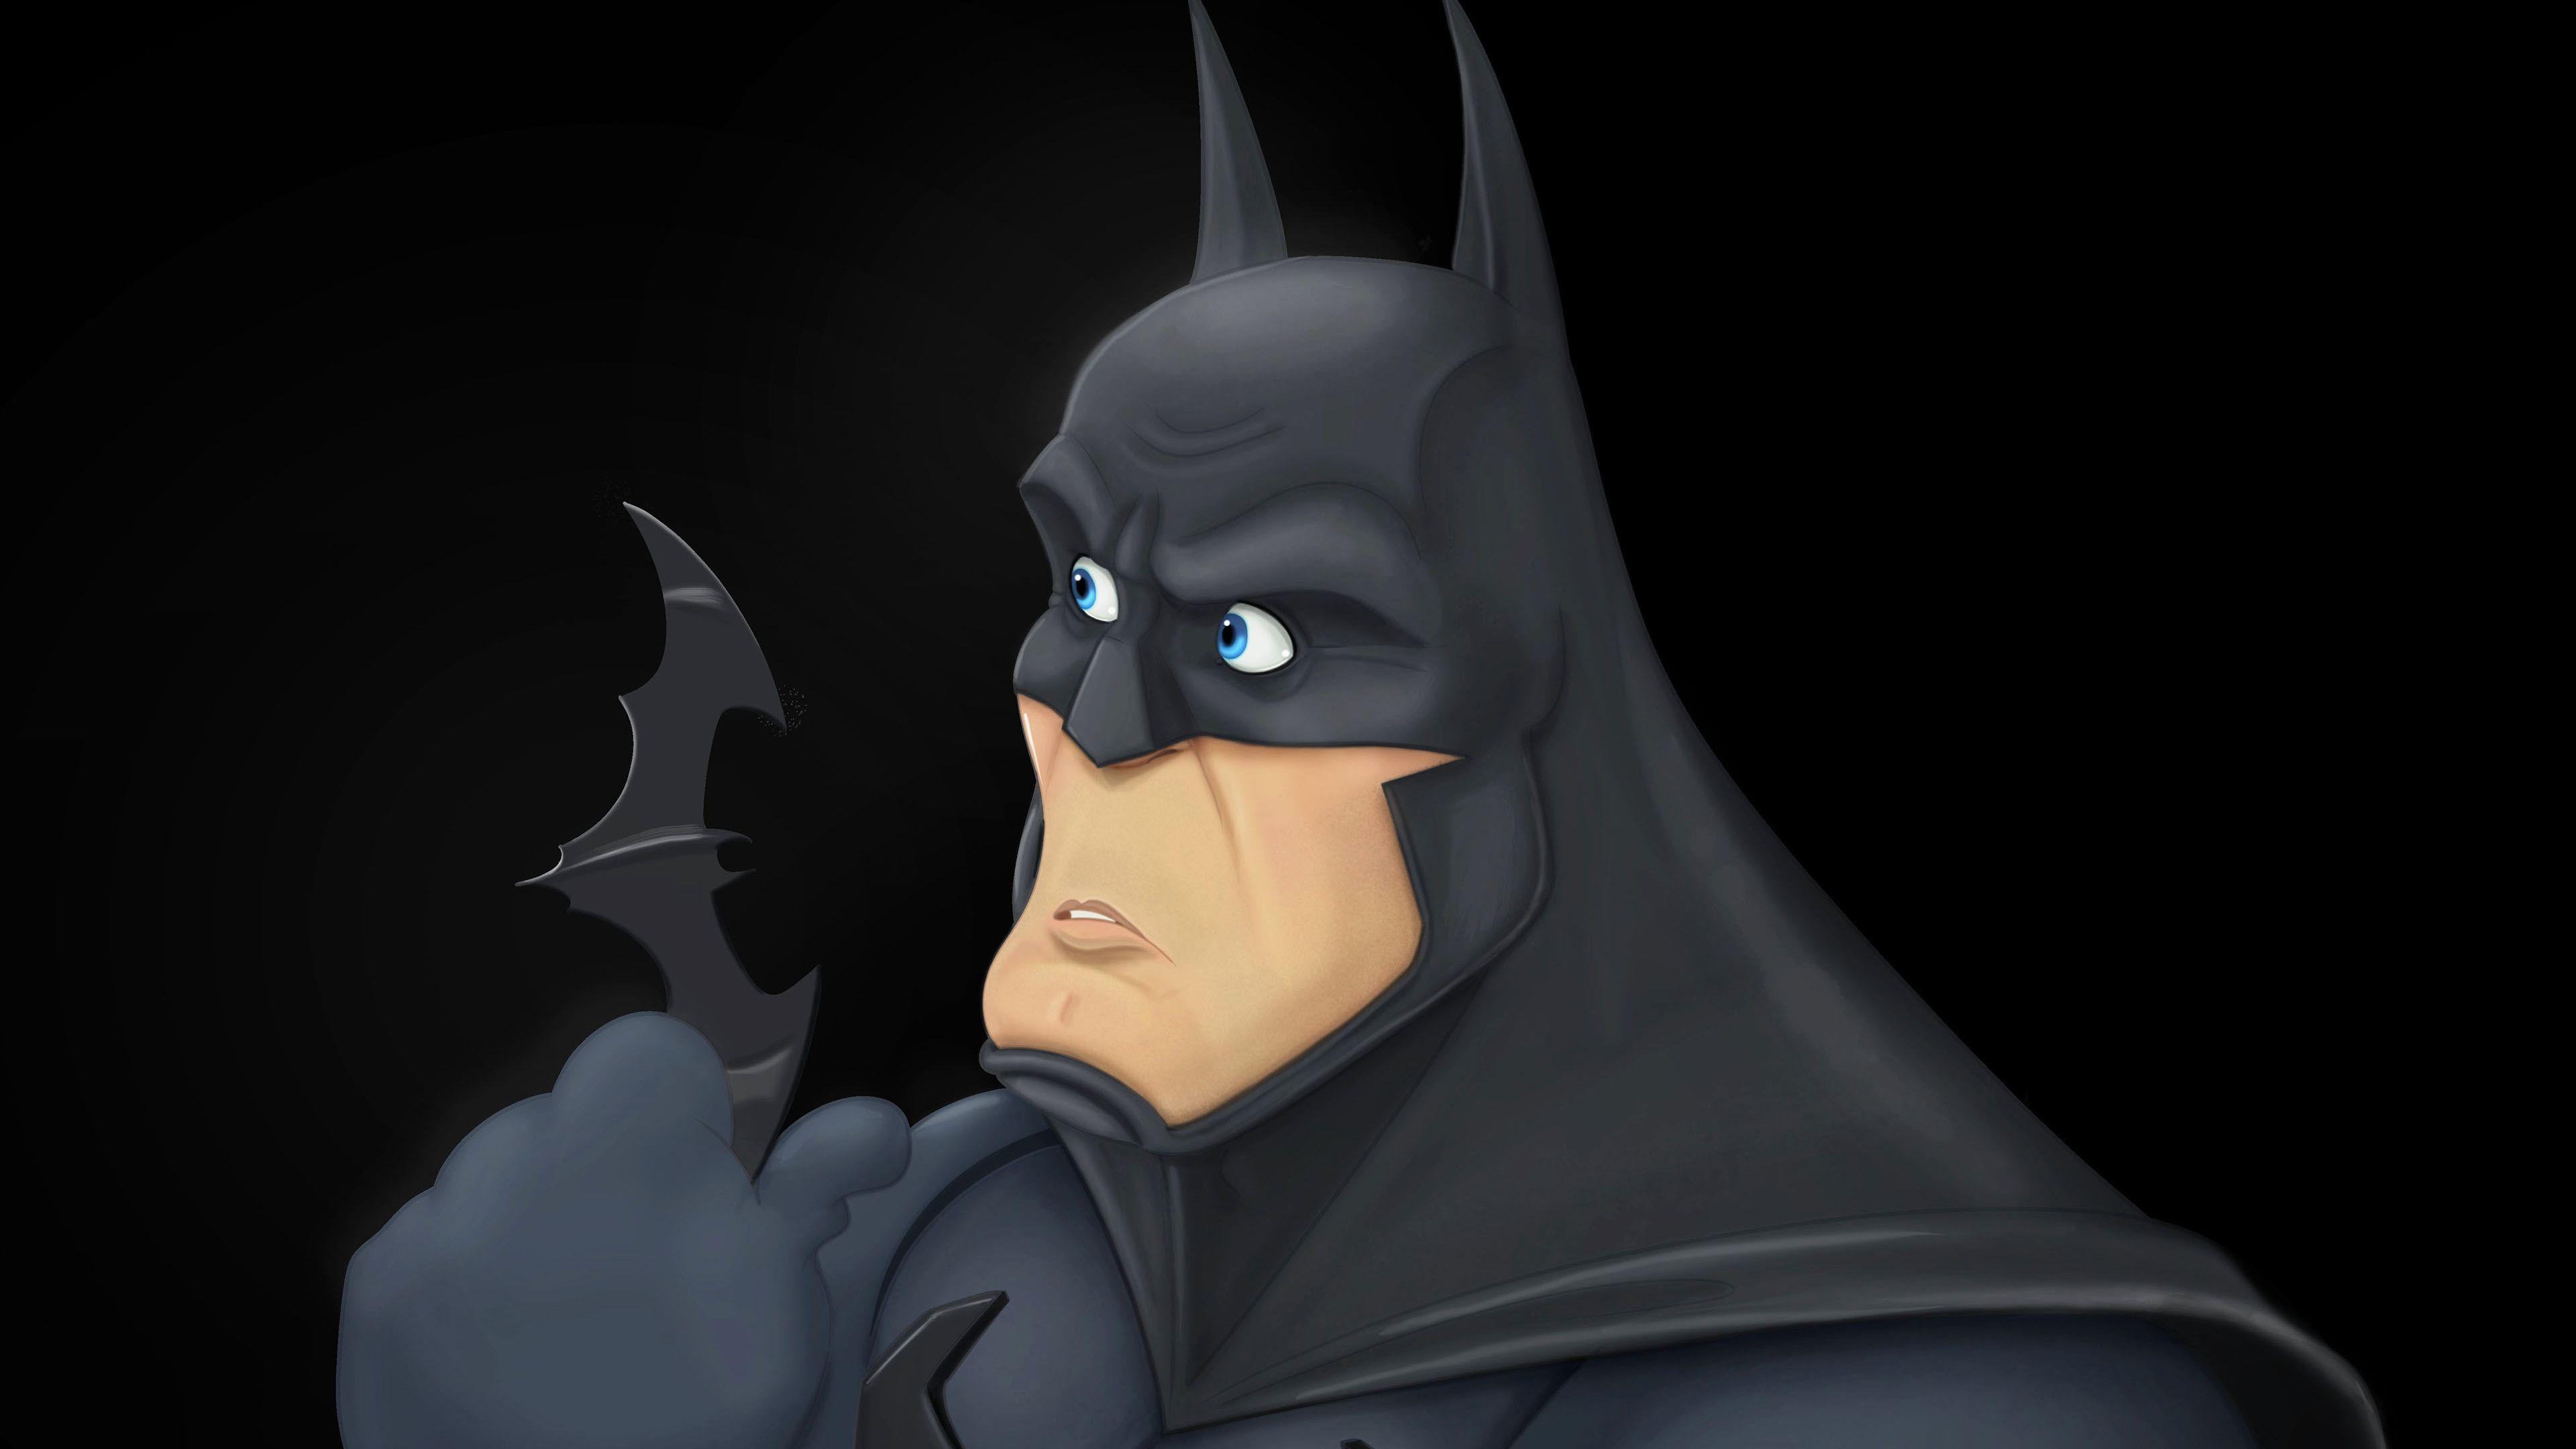 Batman With Batrage Art 4k Superheroes Wallpapers Hd Wallpapers